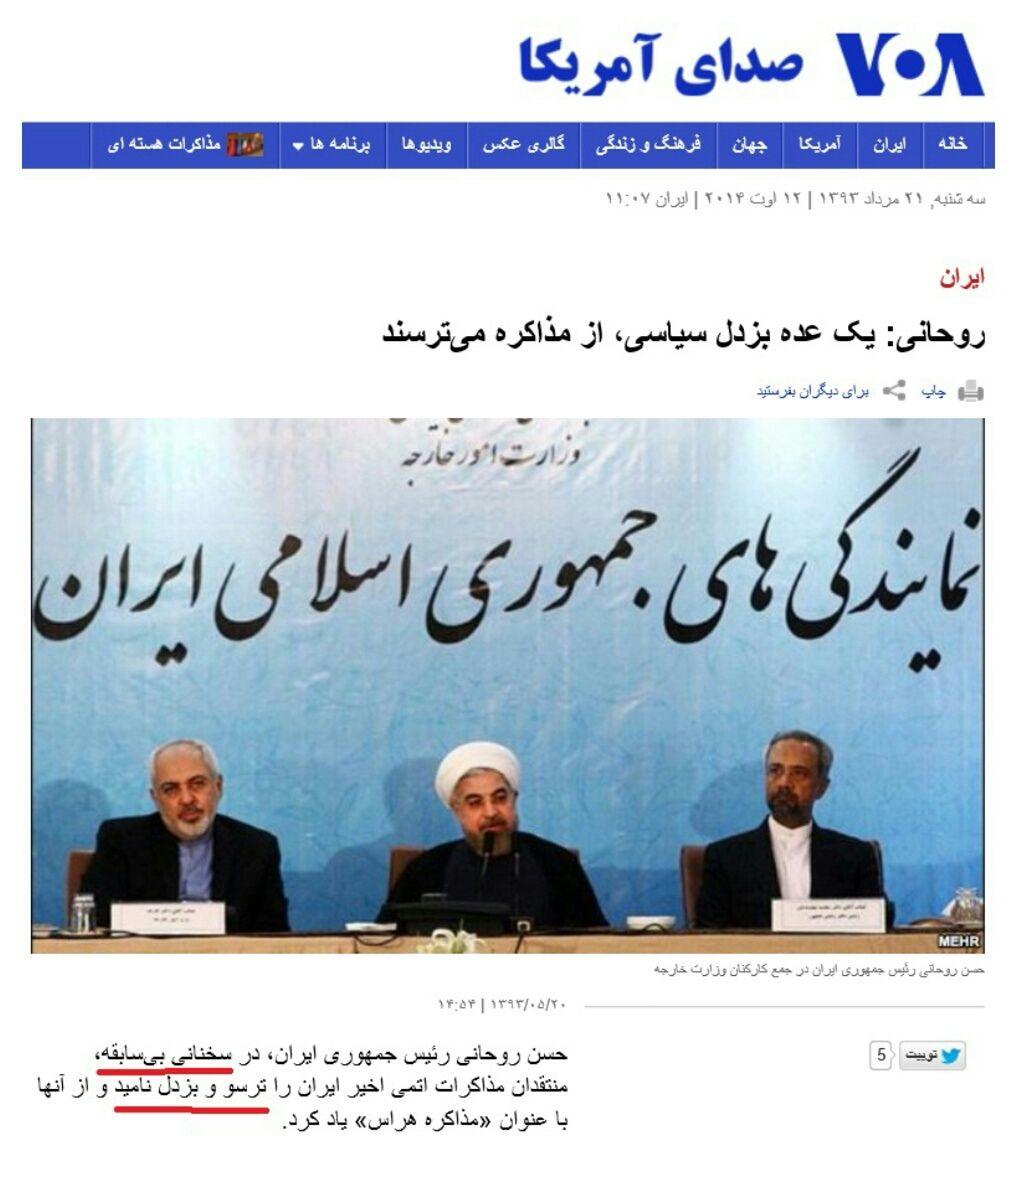 http://www.afkarnews.ir/images/docs/000355/n00355224-r-b-002.jpg